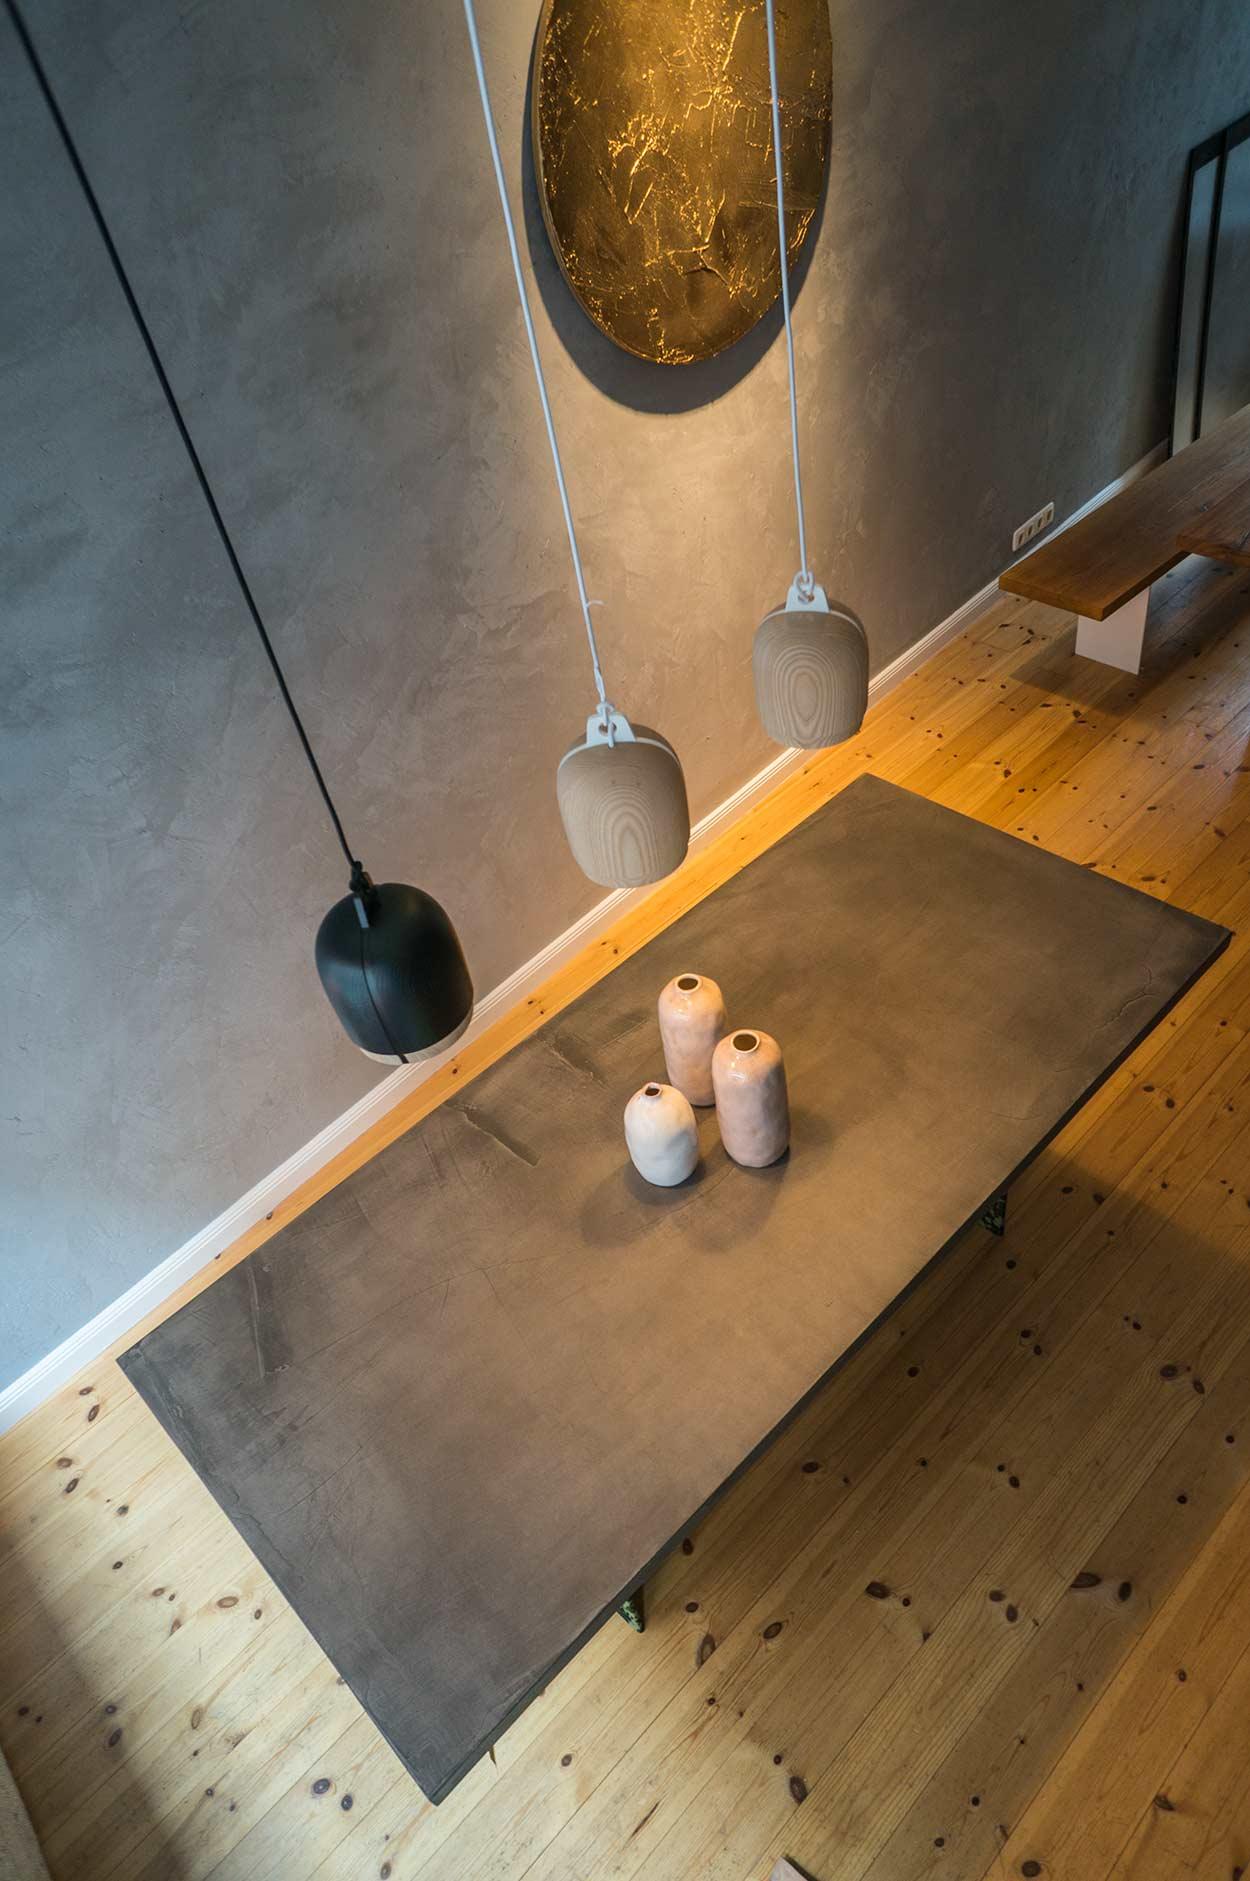 Tisch: Konstantin Manufaktur Vasen: Pendelleuchten: Objekt: FRNCL.com